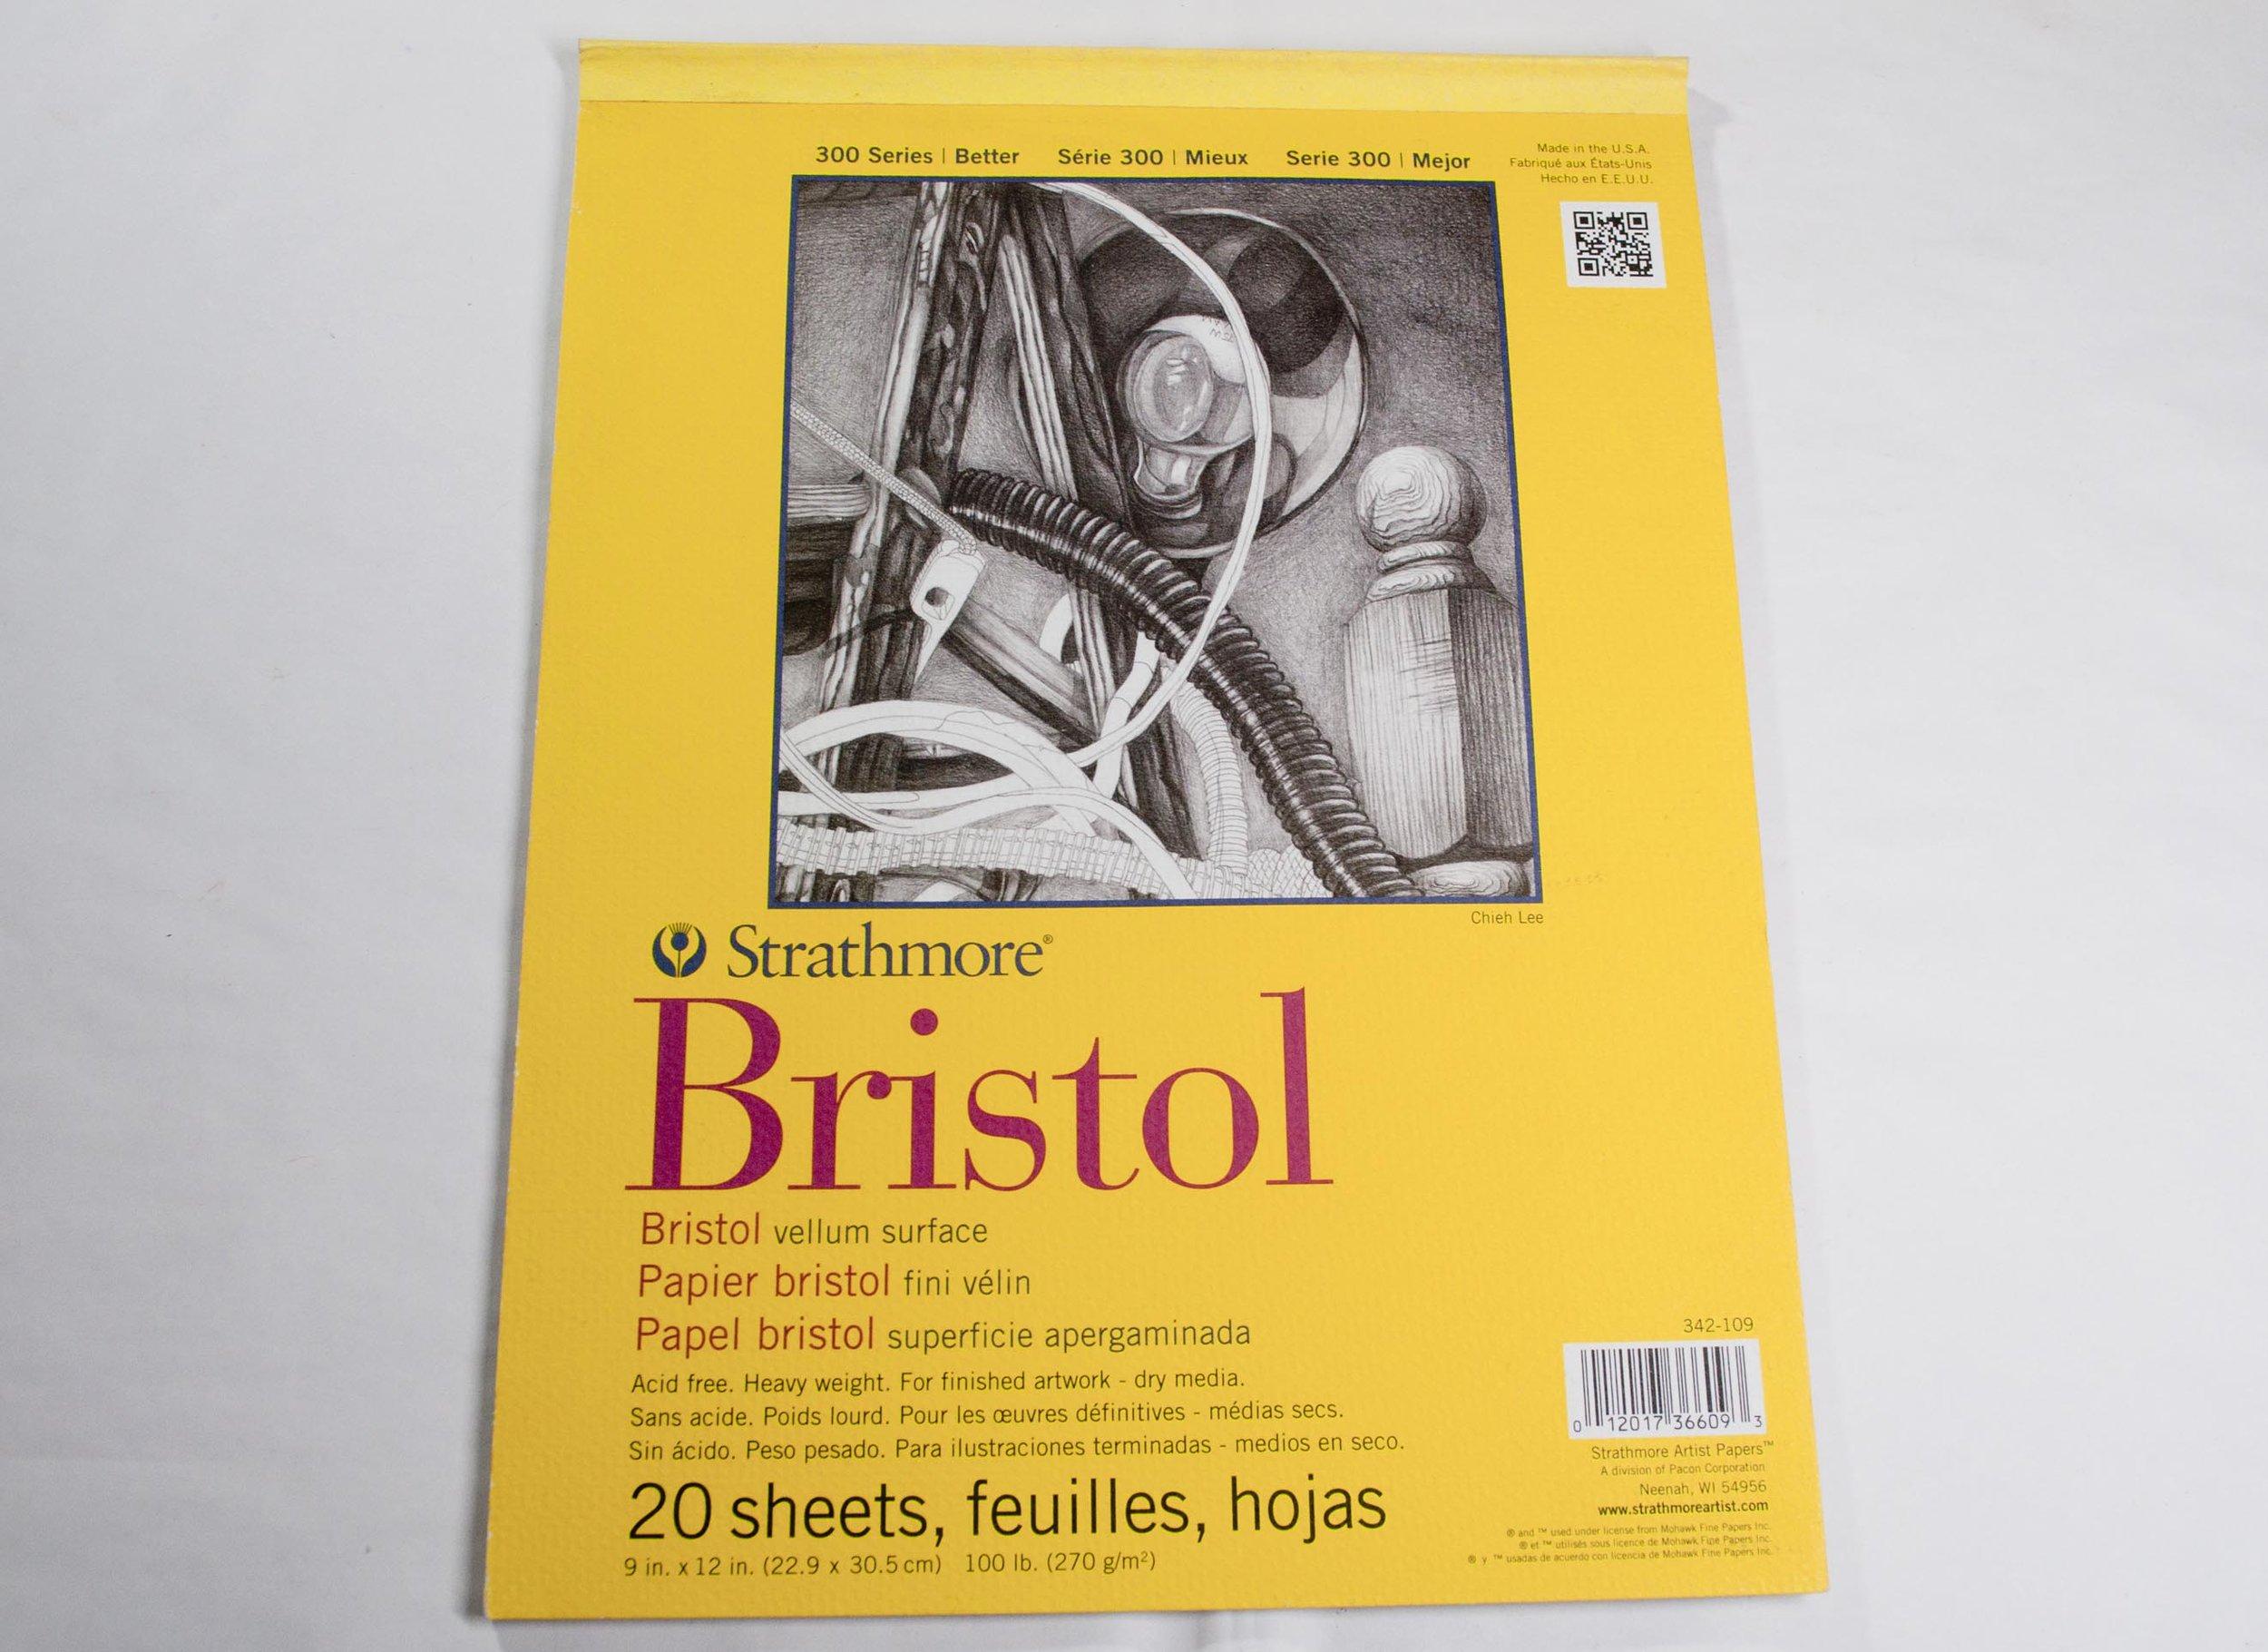 Strathmore 300 Series Bristol Velum Surface